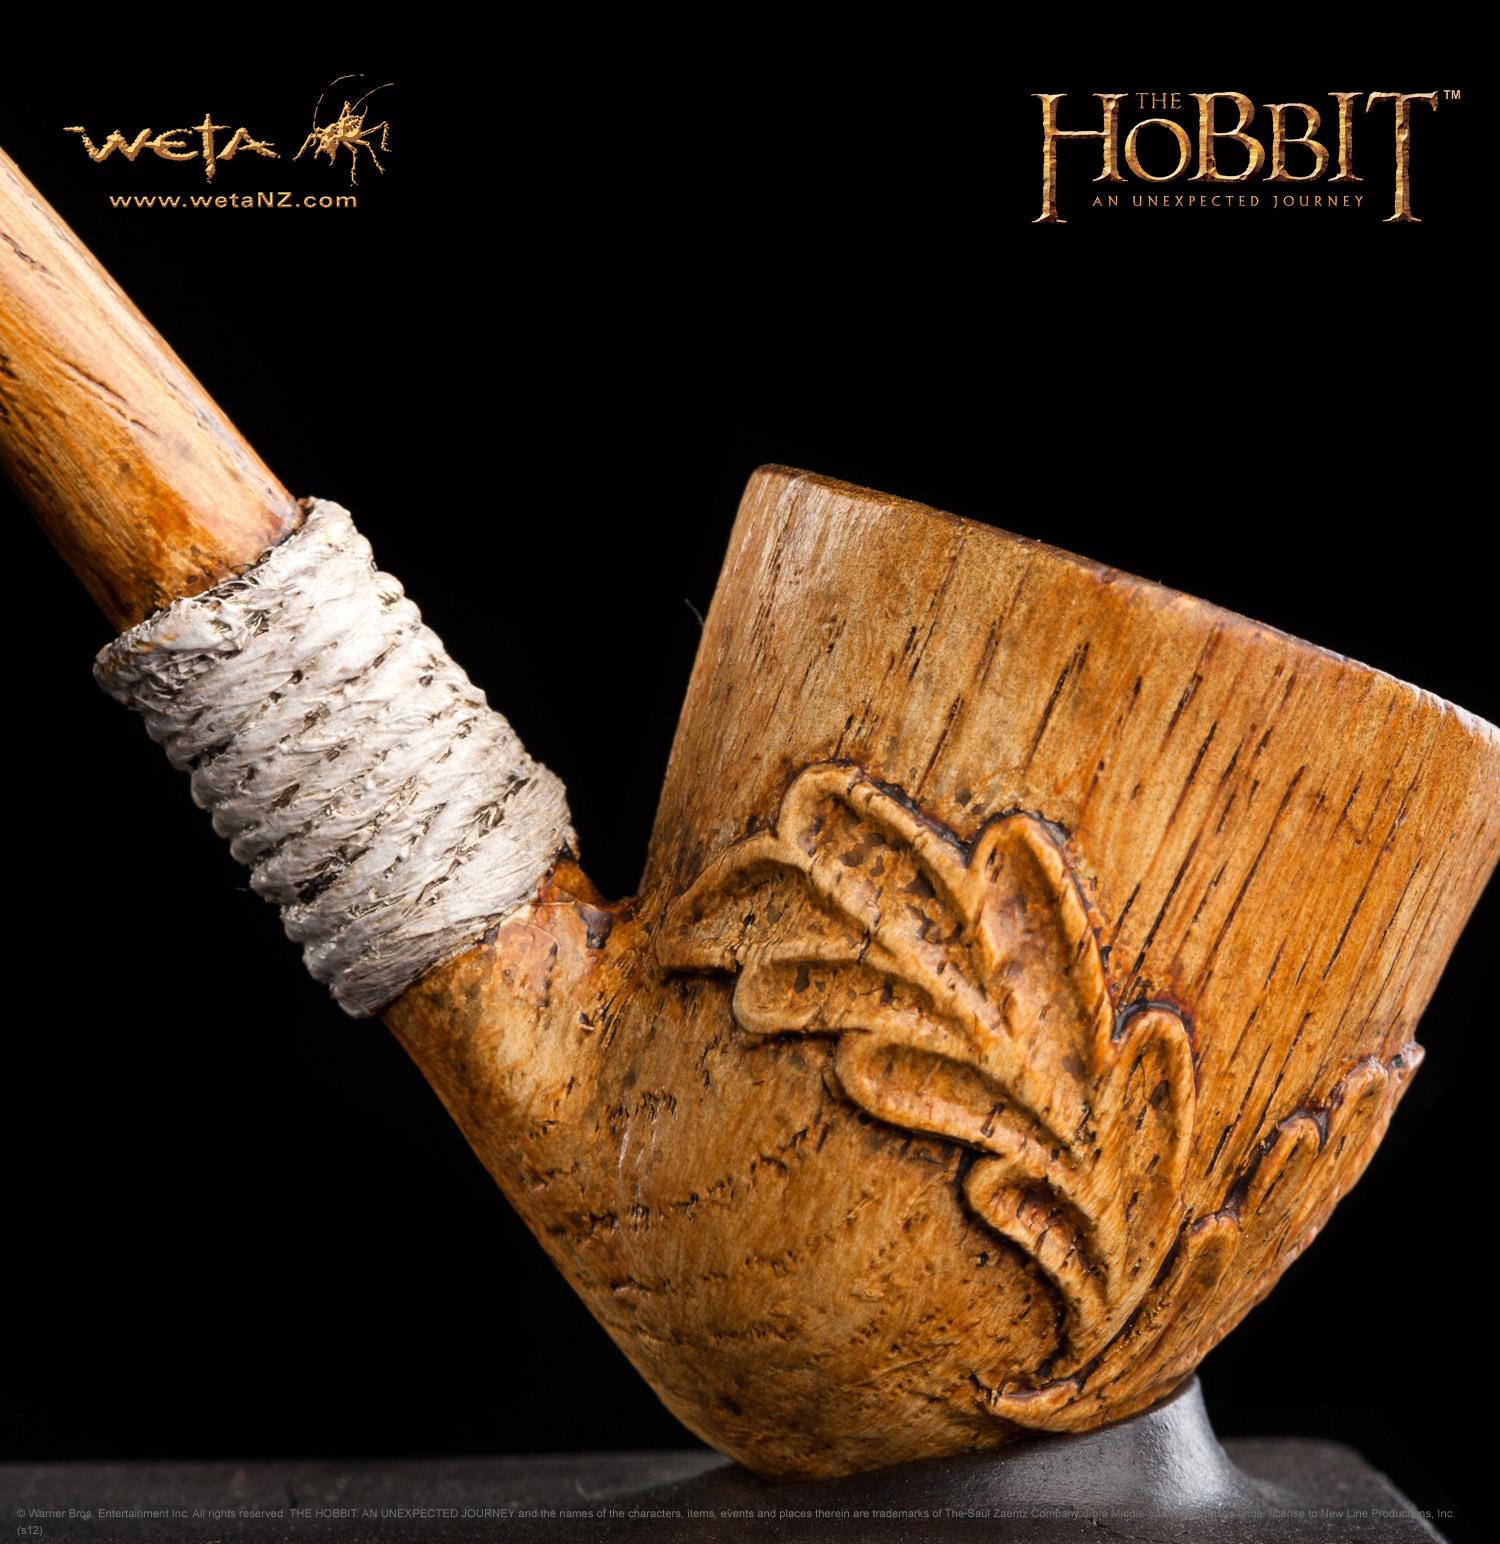 The Desolation Of Smaug - Pipe Of Bilbo Baggins Replica